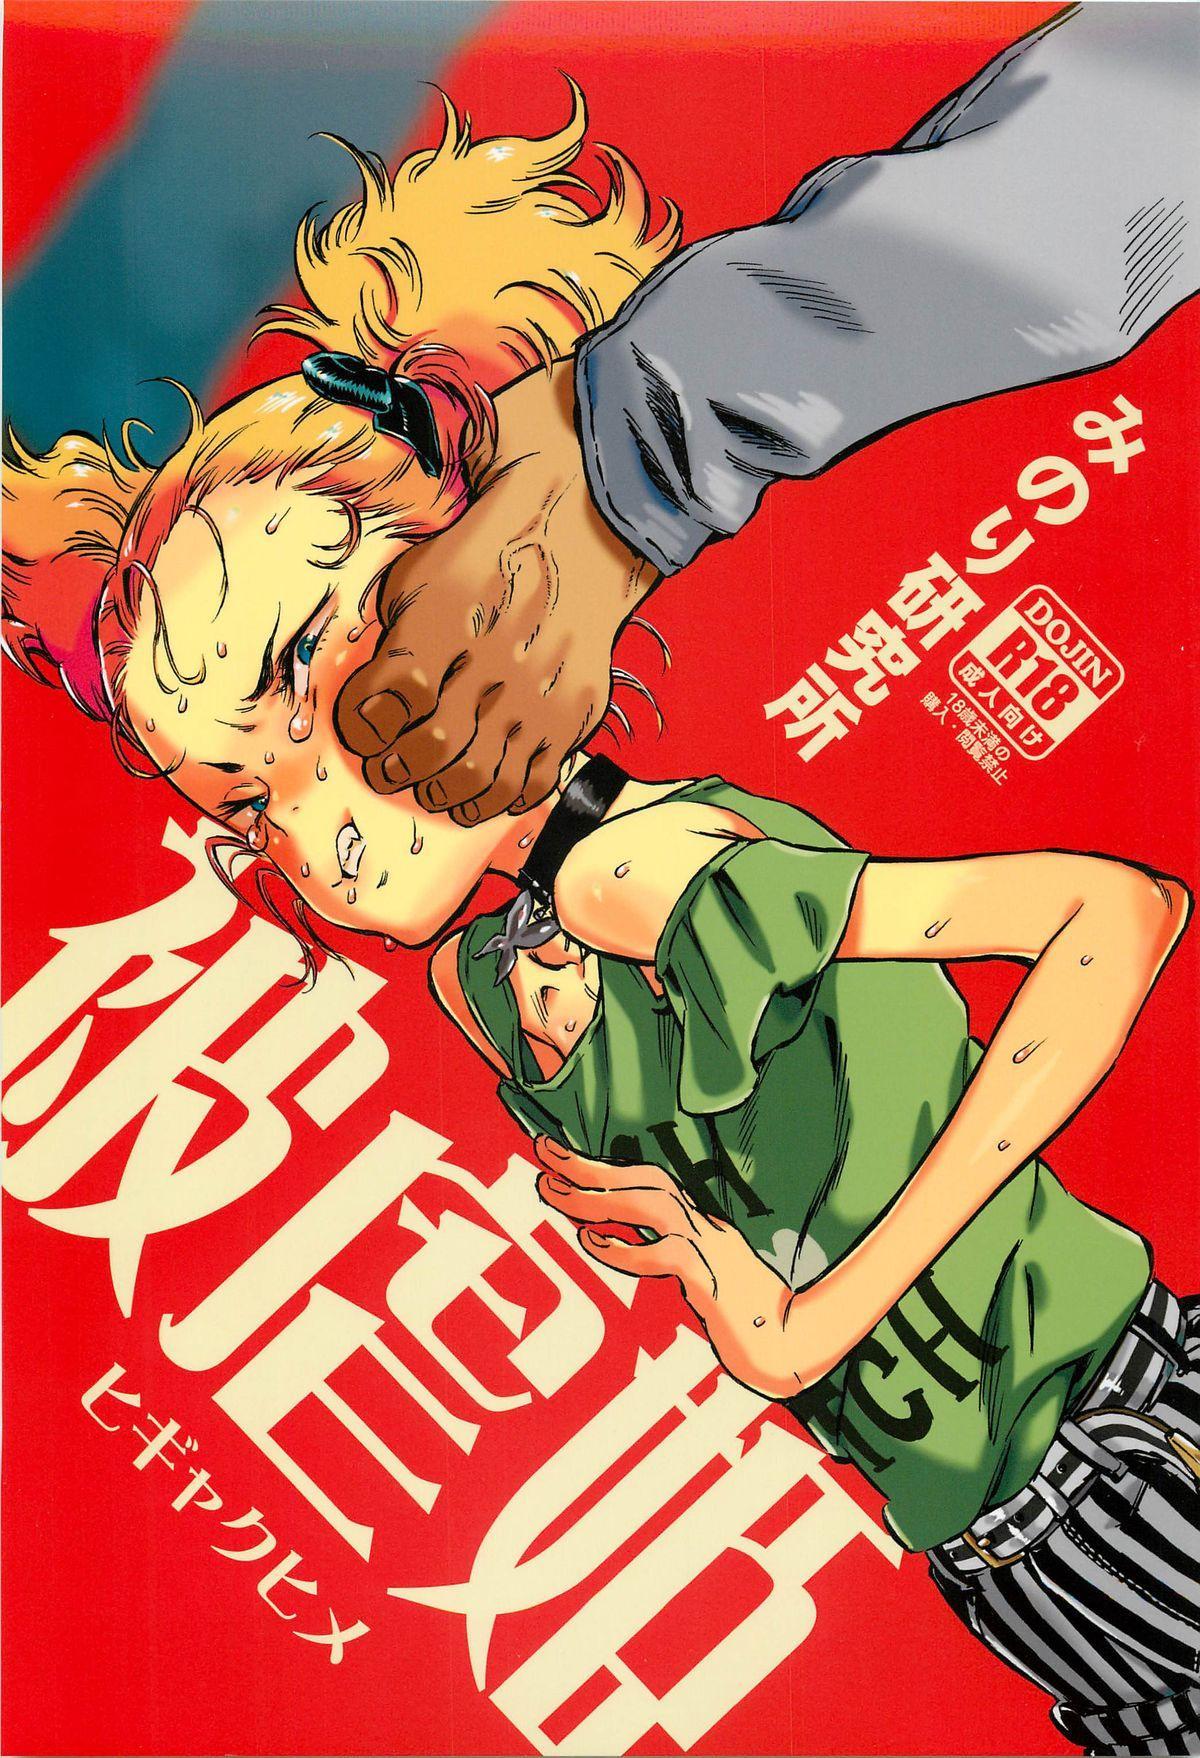 Higyaku Hime 0